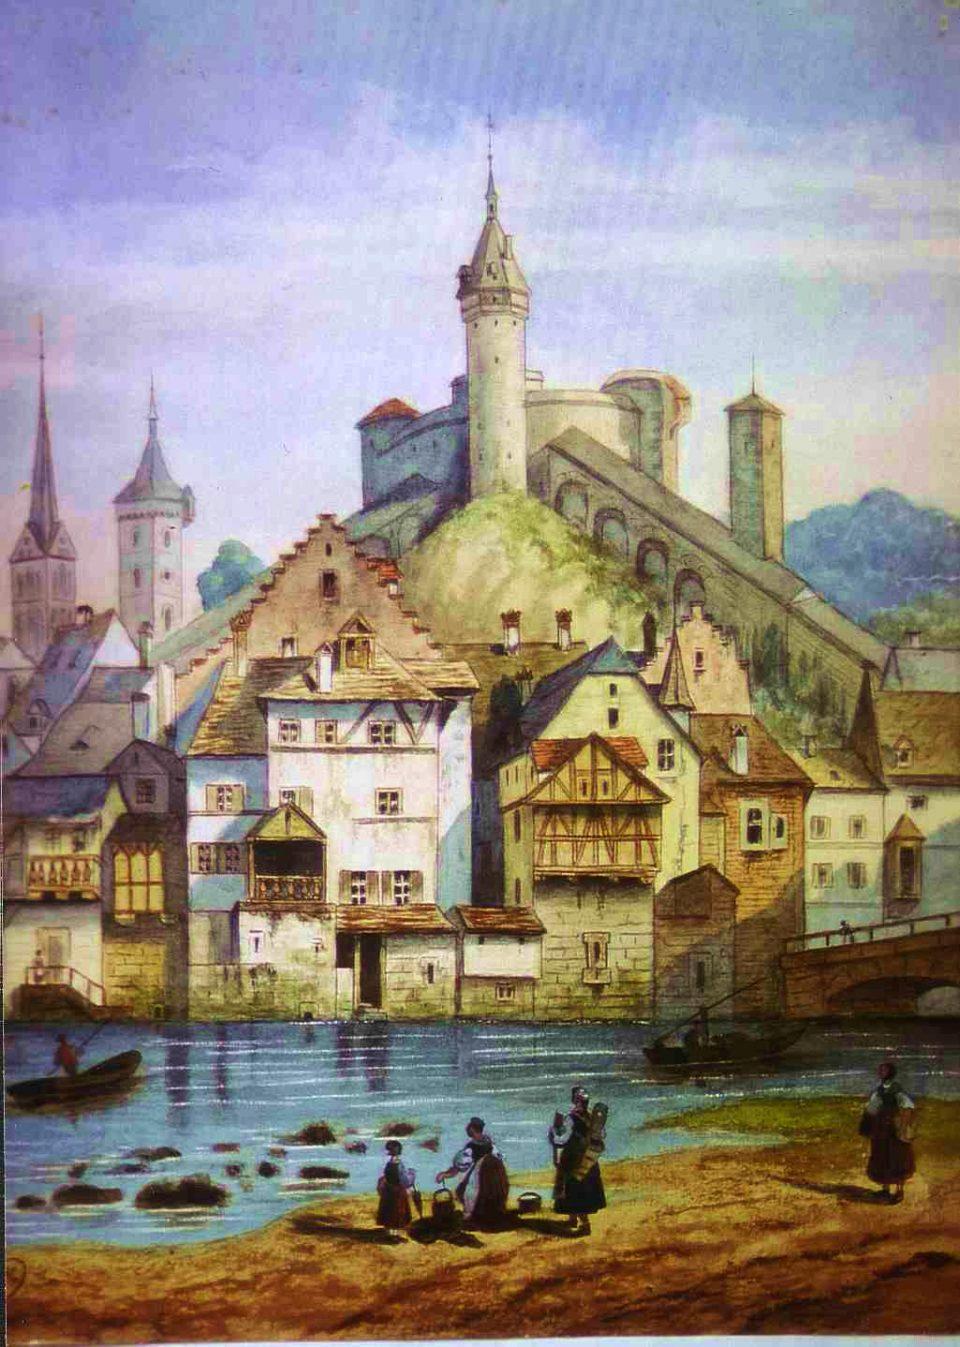 8_Watercolour by August_Menken